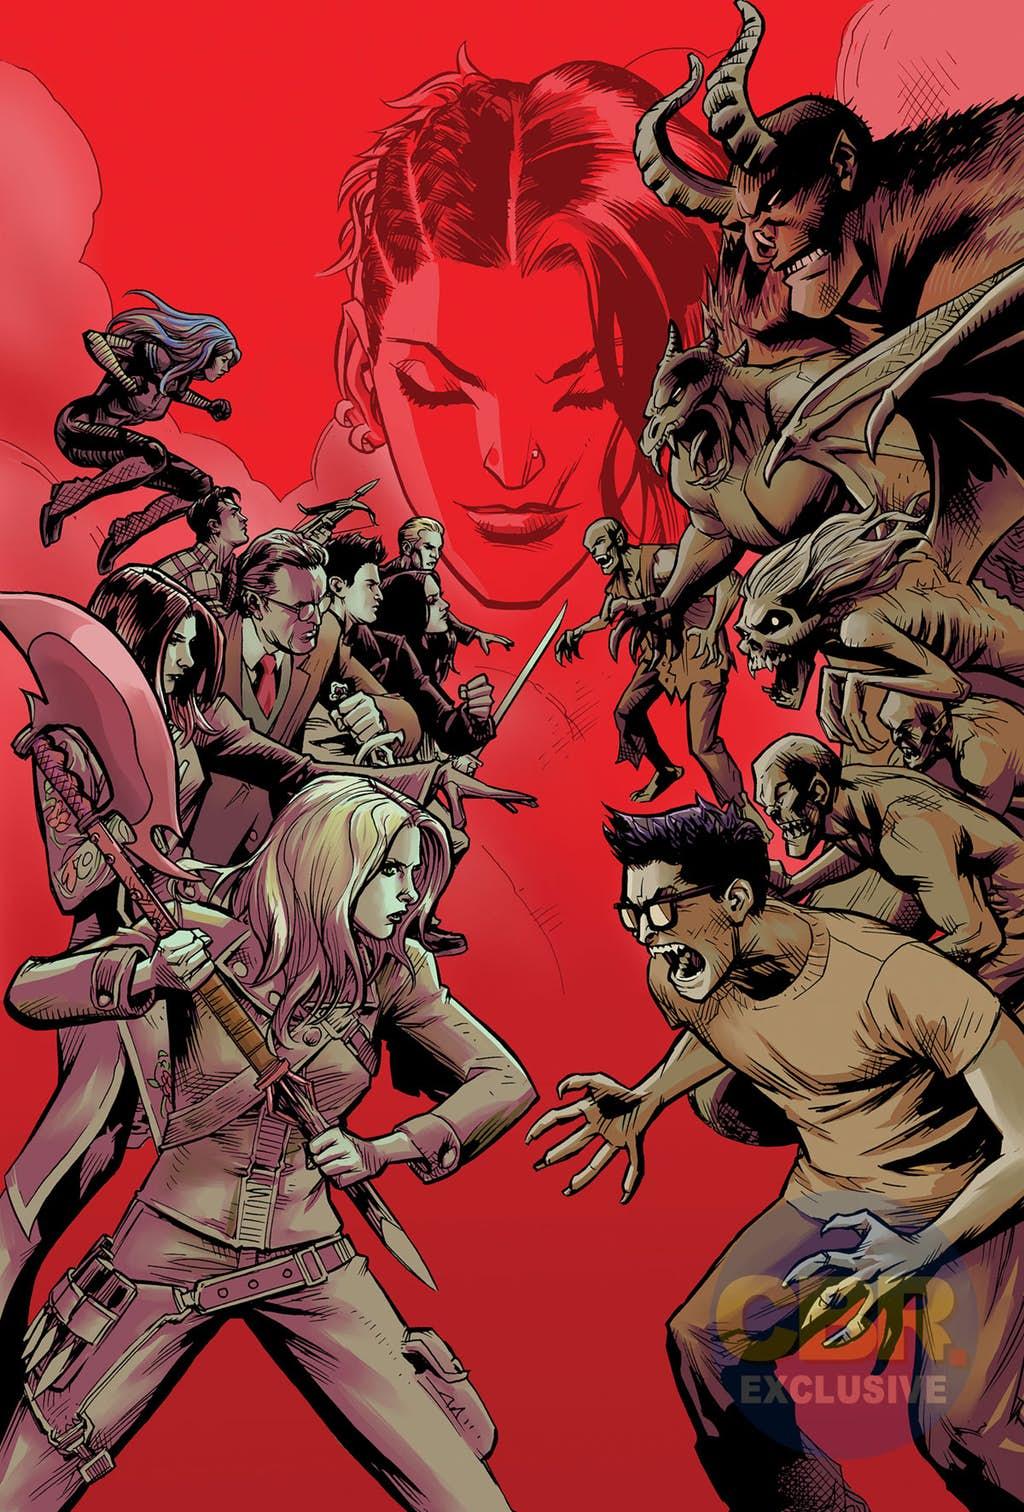 joss-whedon-returns-to-buffy-the-vampire-slayer-for-season-12-comic2